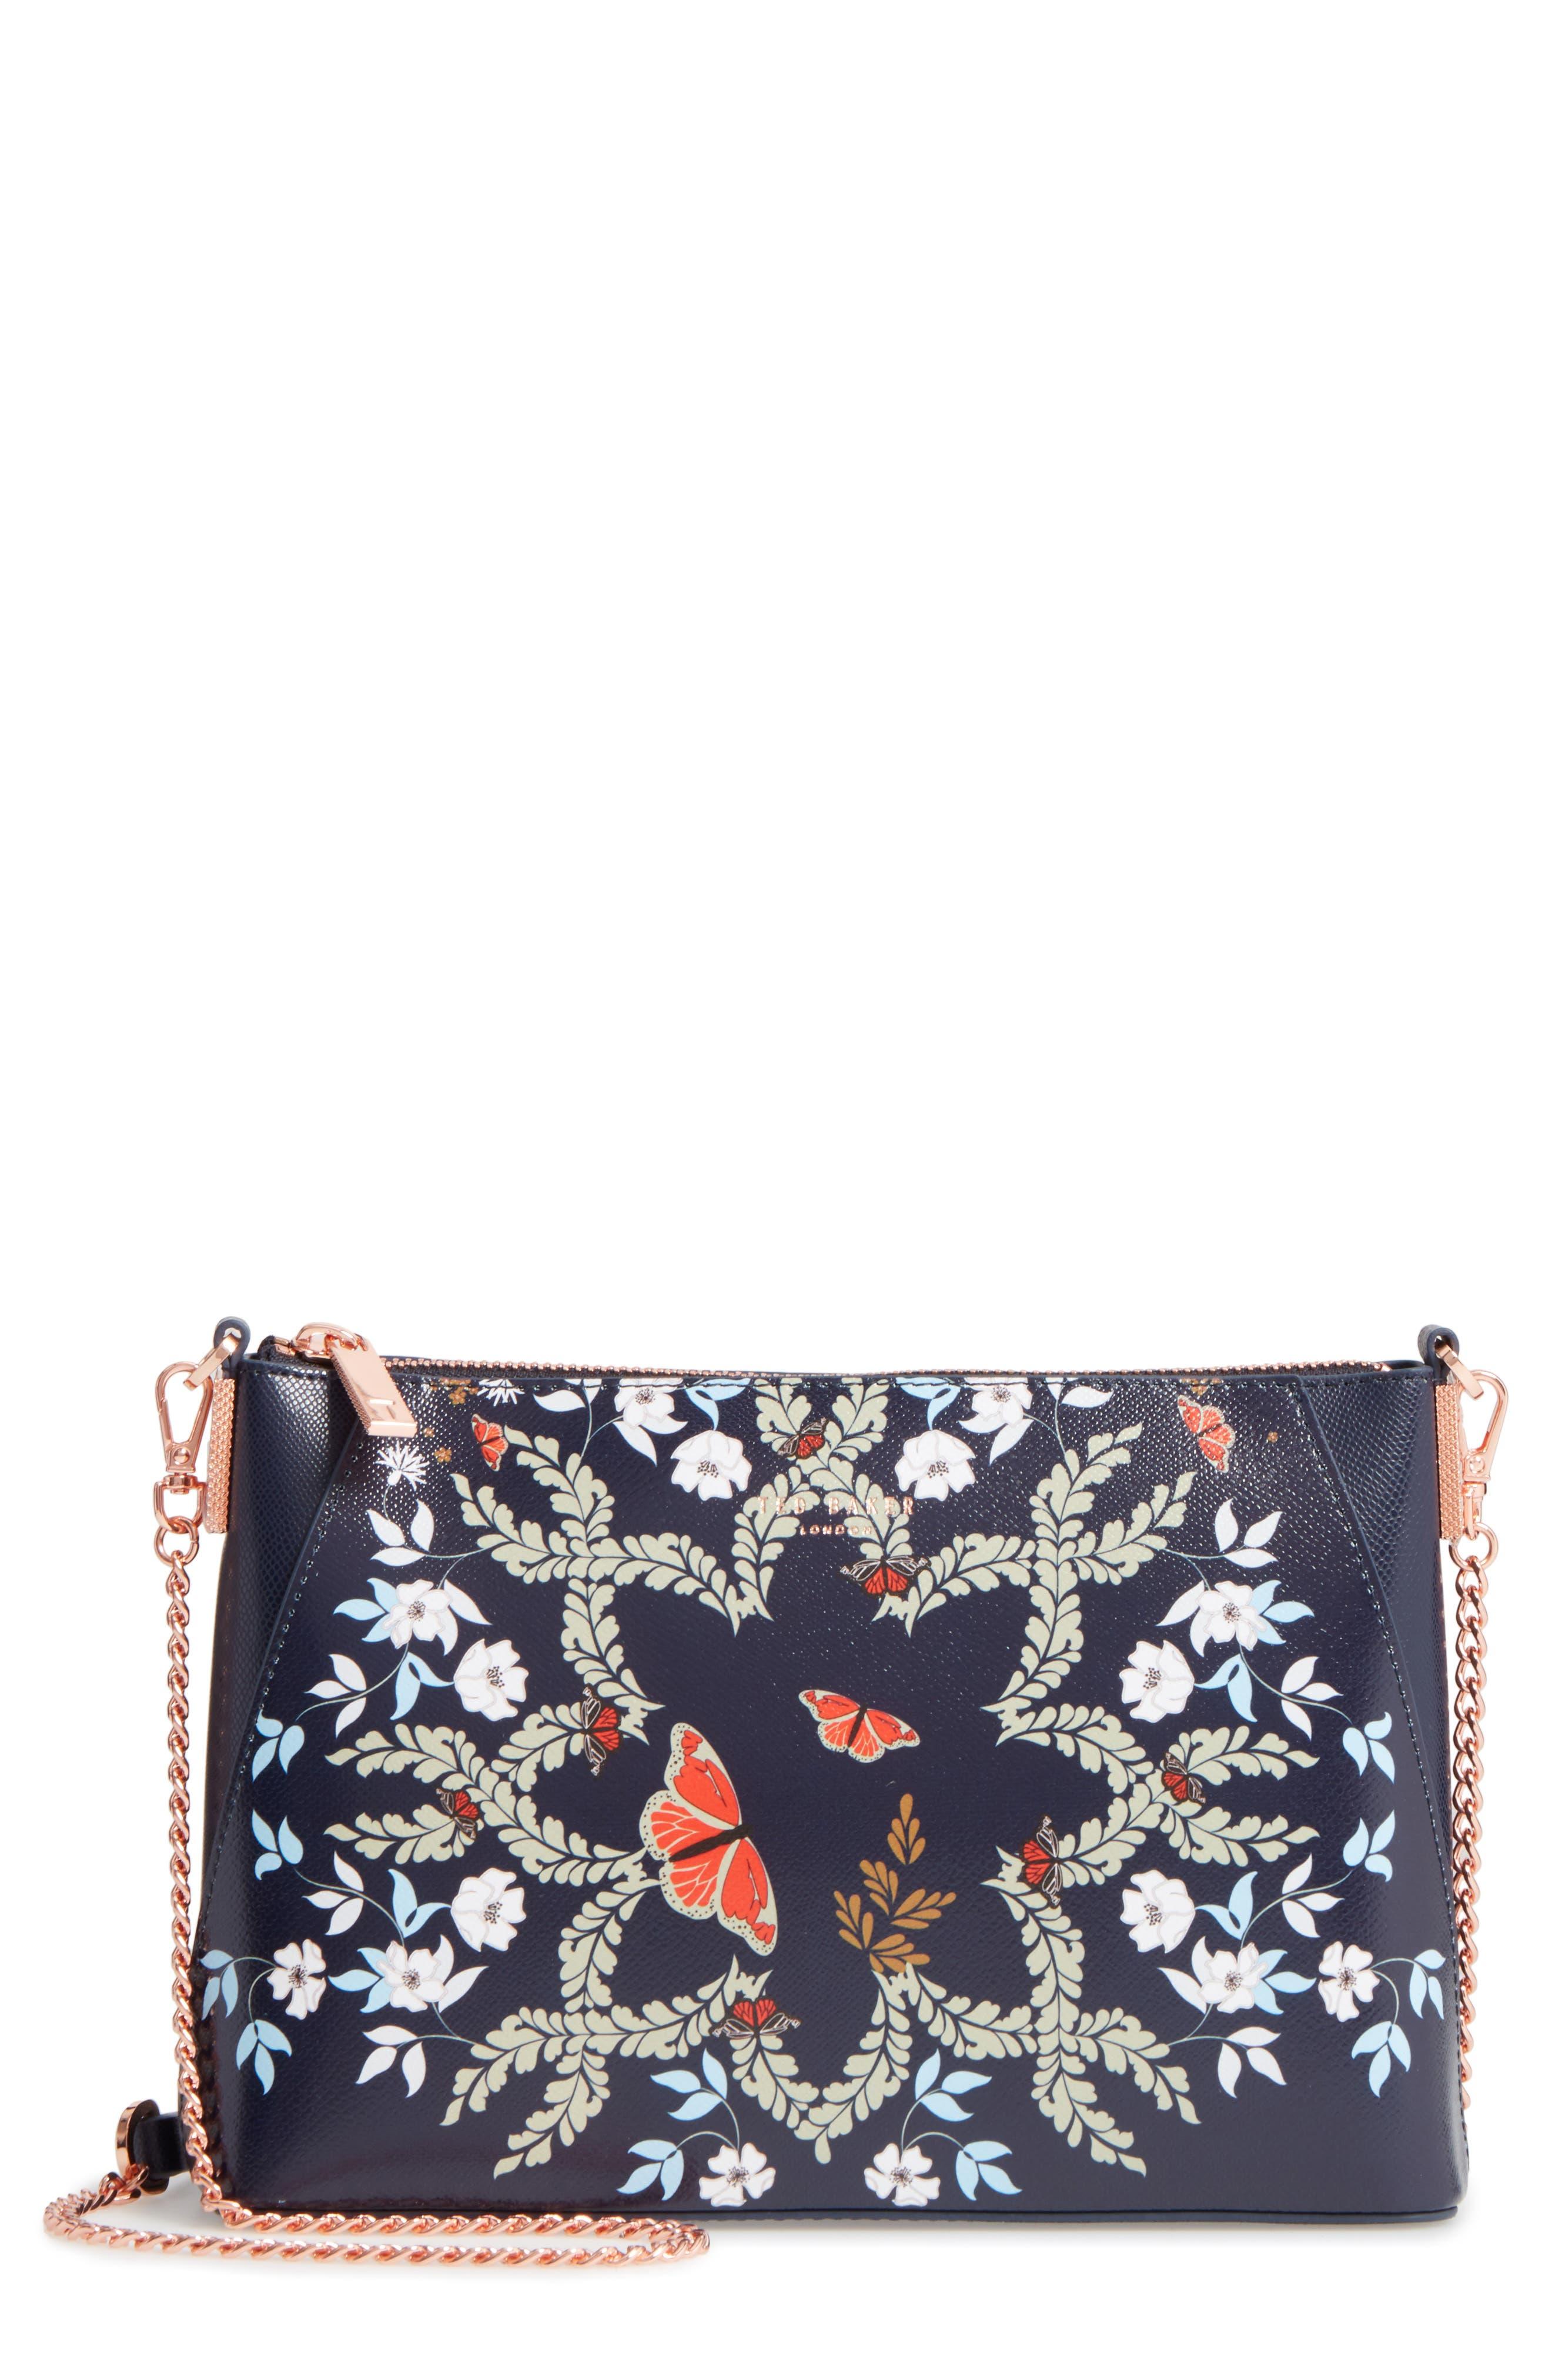 Ted Baker London Marisiaa - Kyoto Gardens Leather Crossbody Bag